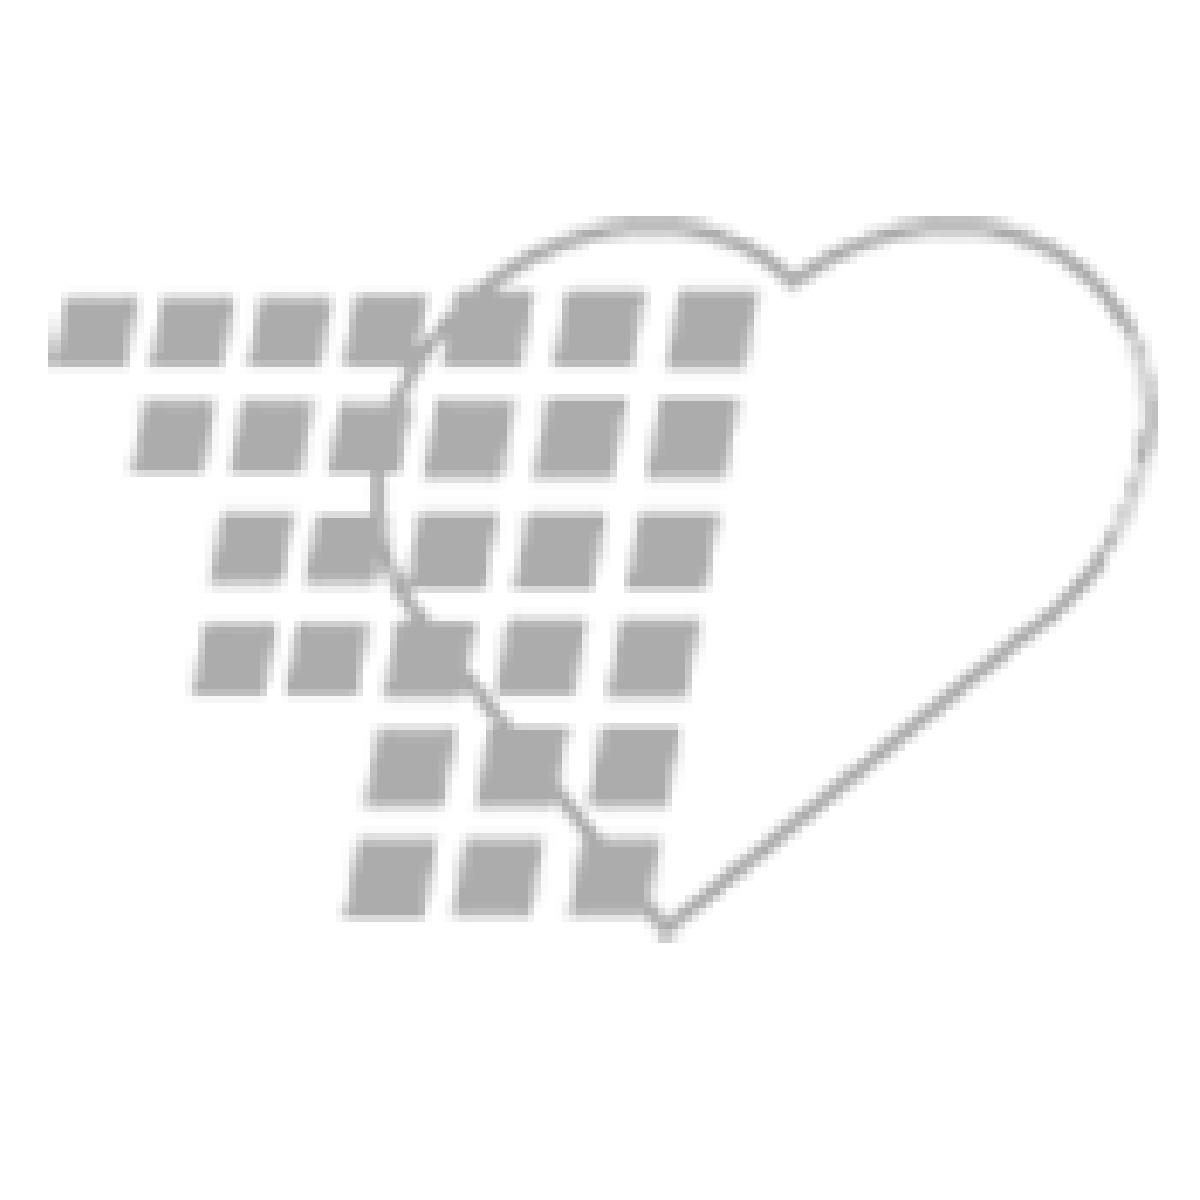 03-78-4010 - Sharps-A-Gator   Torutous Path Sharps Container - 5 Quart